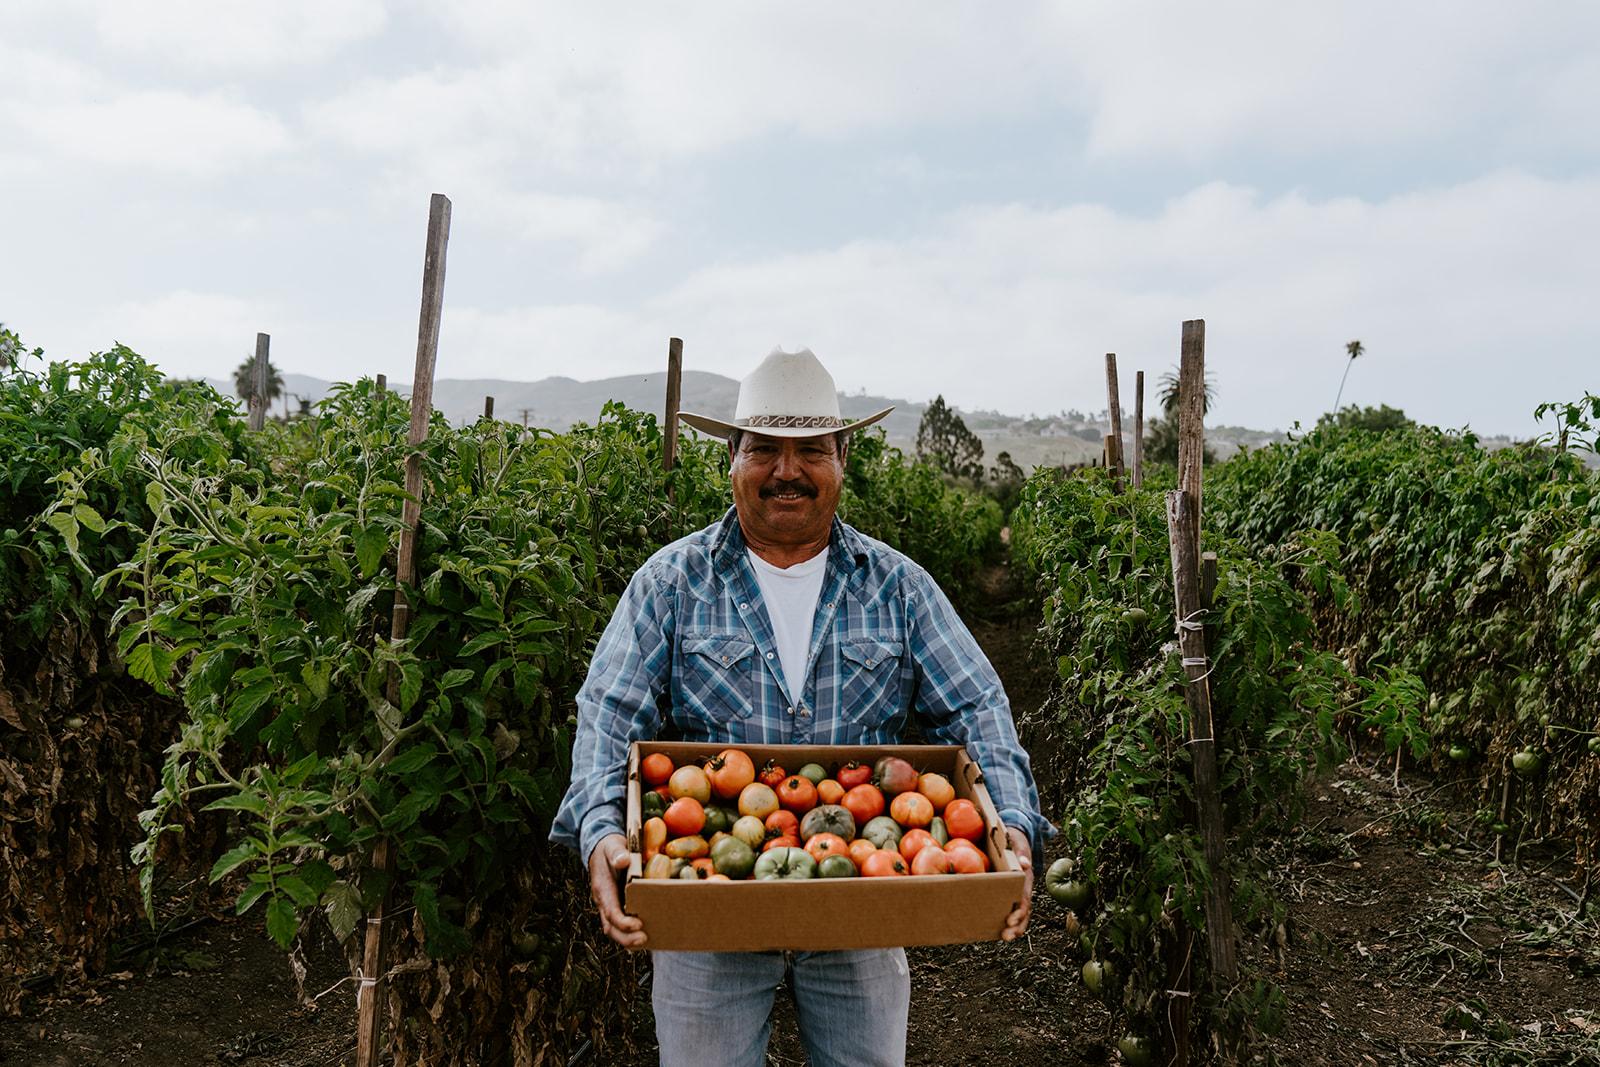 Farmer holding box of tomatoes.